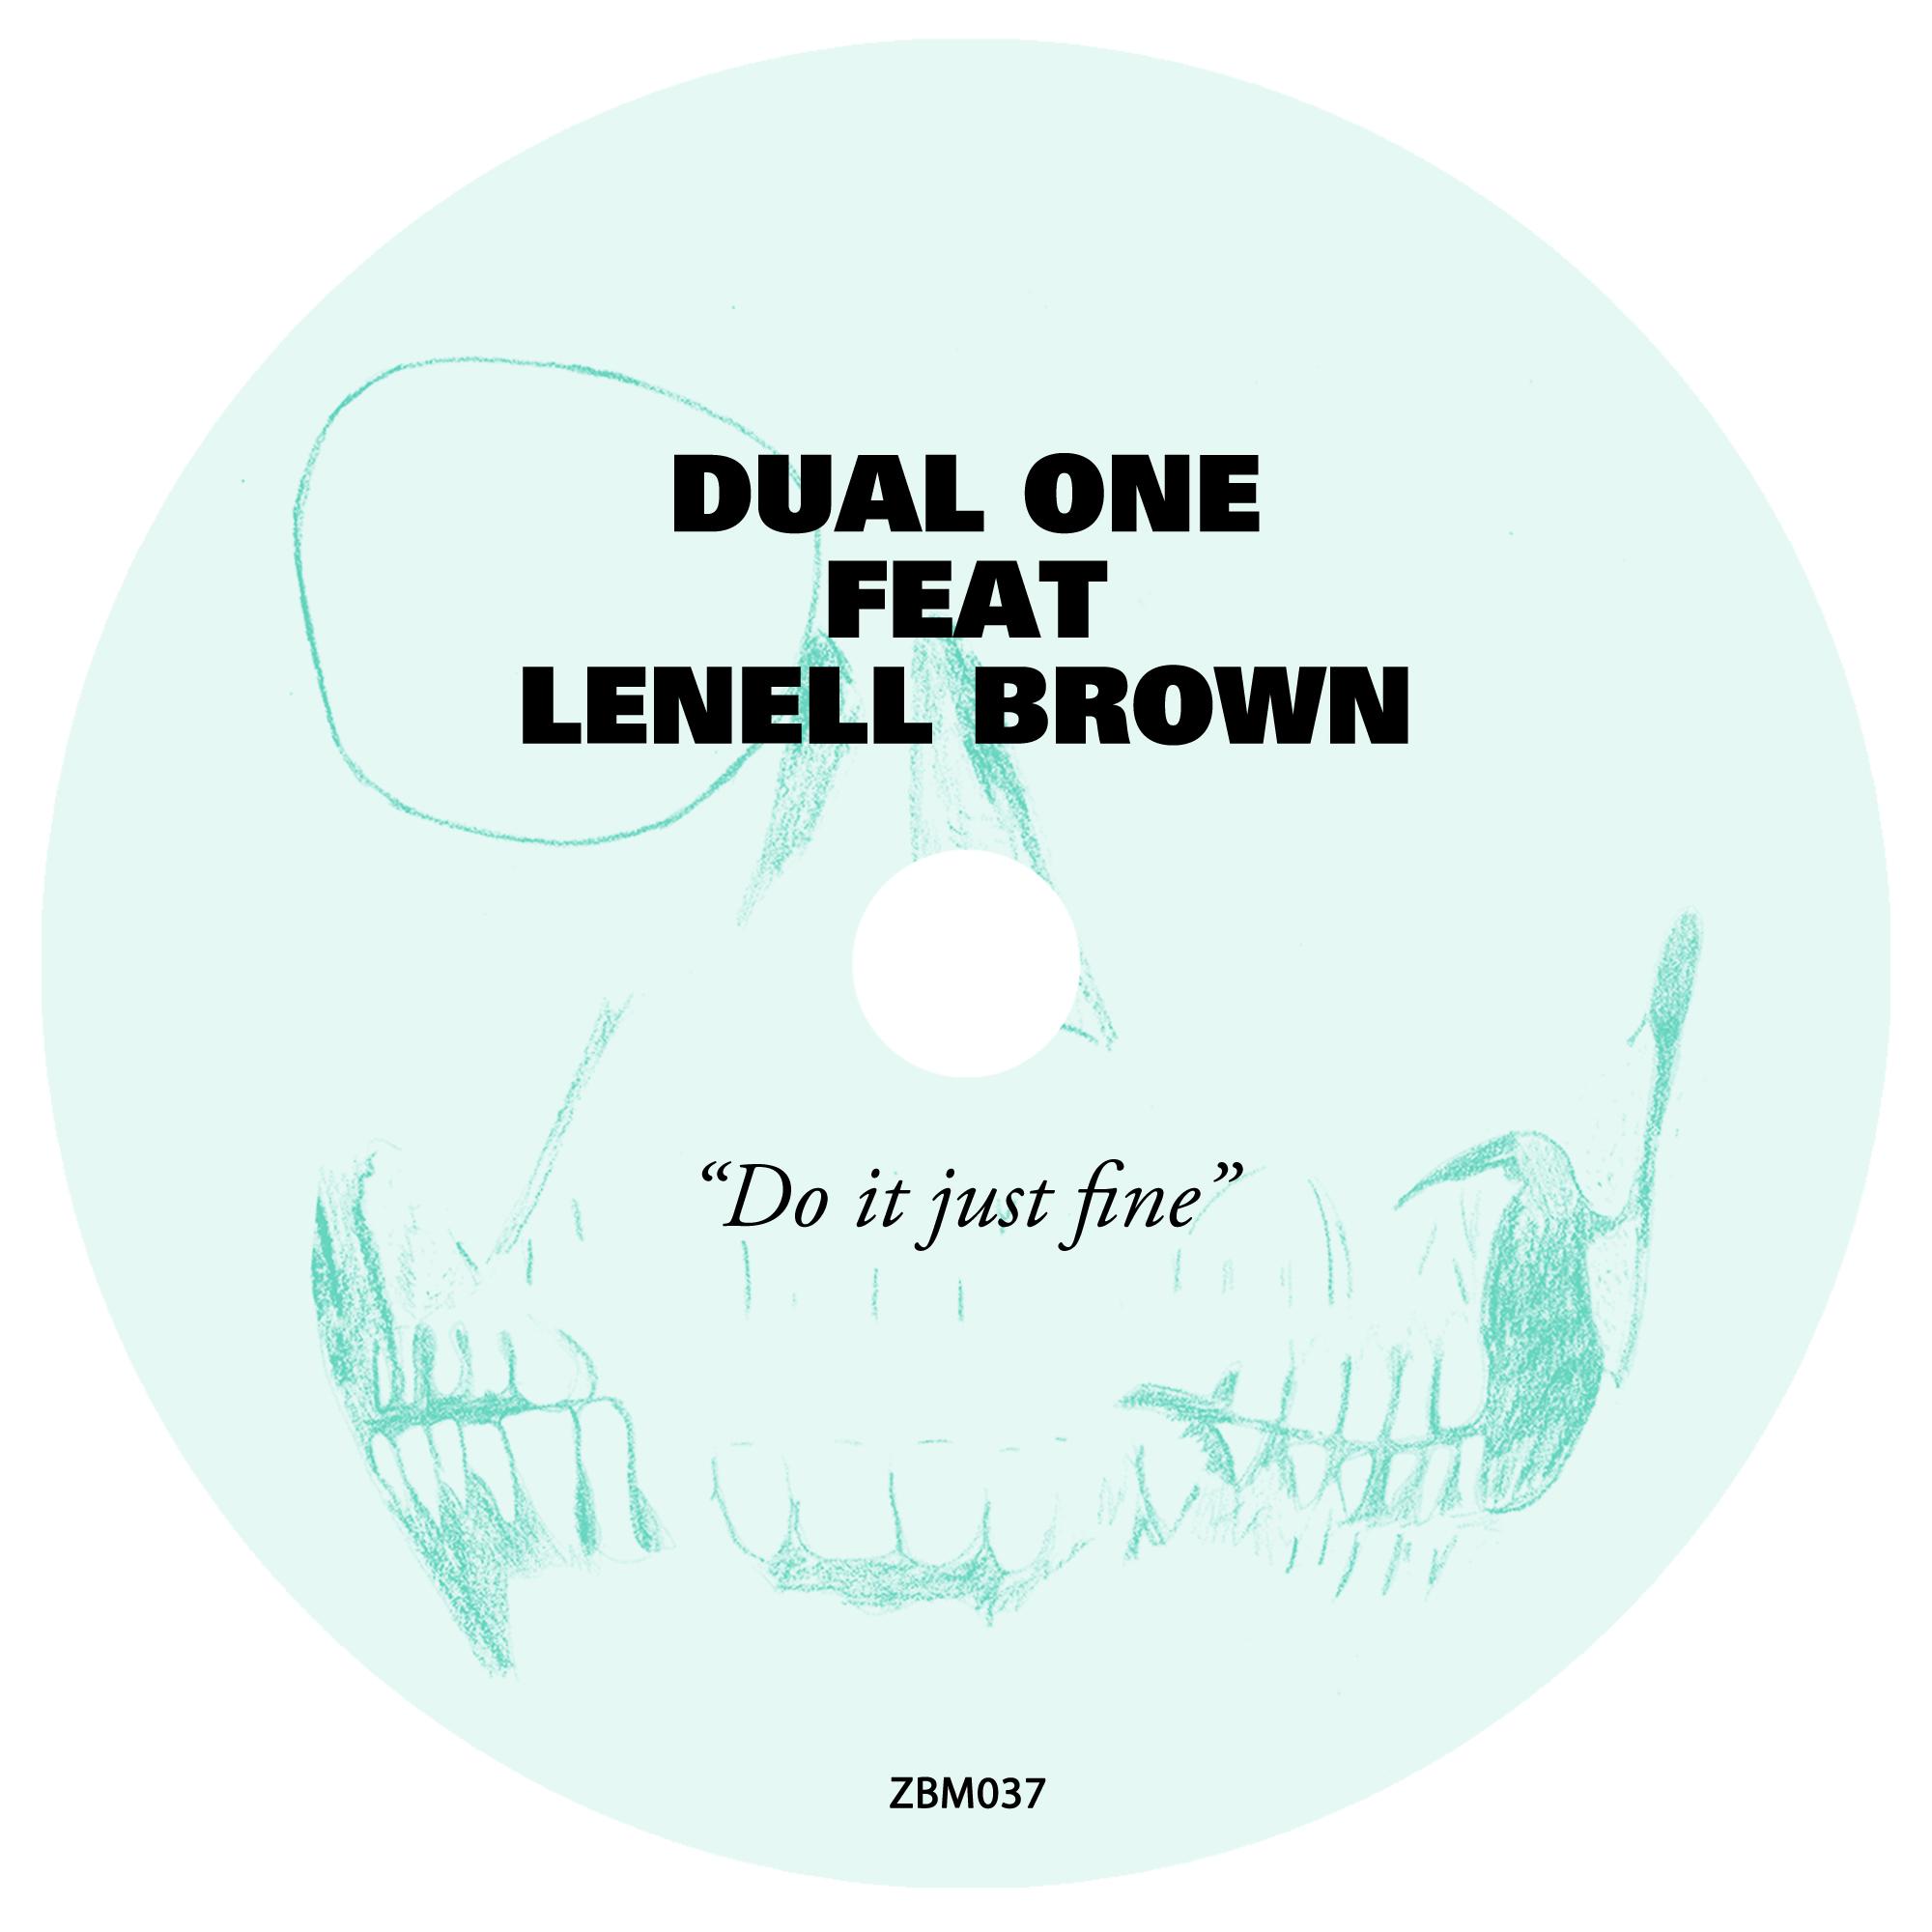 Dual one